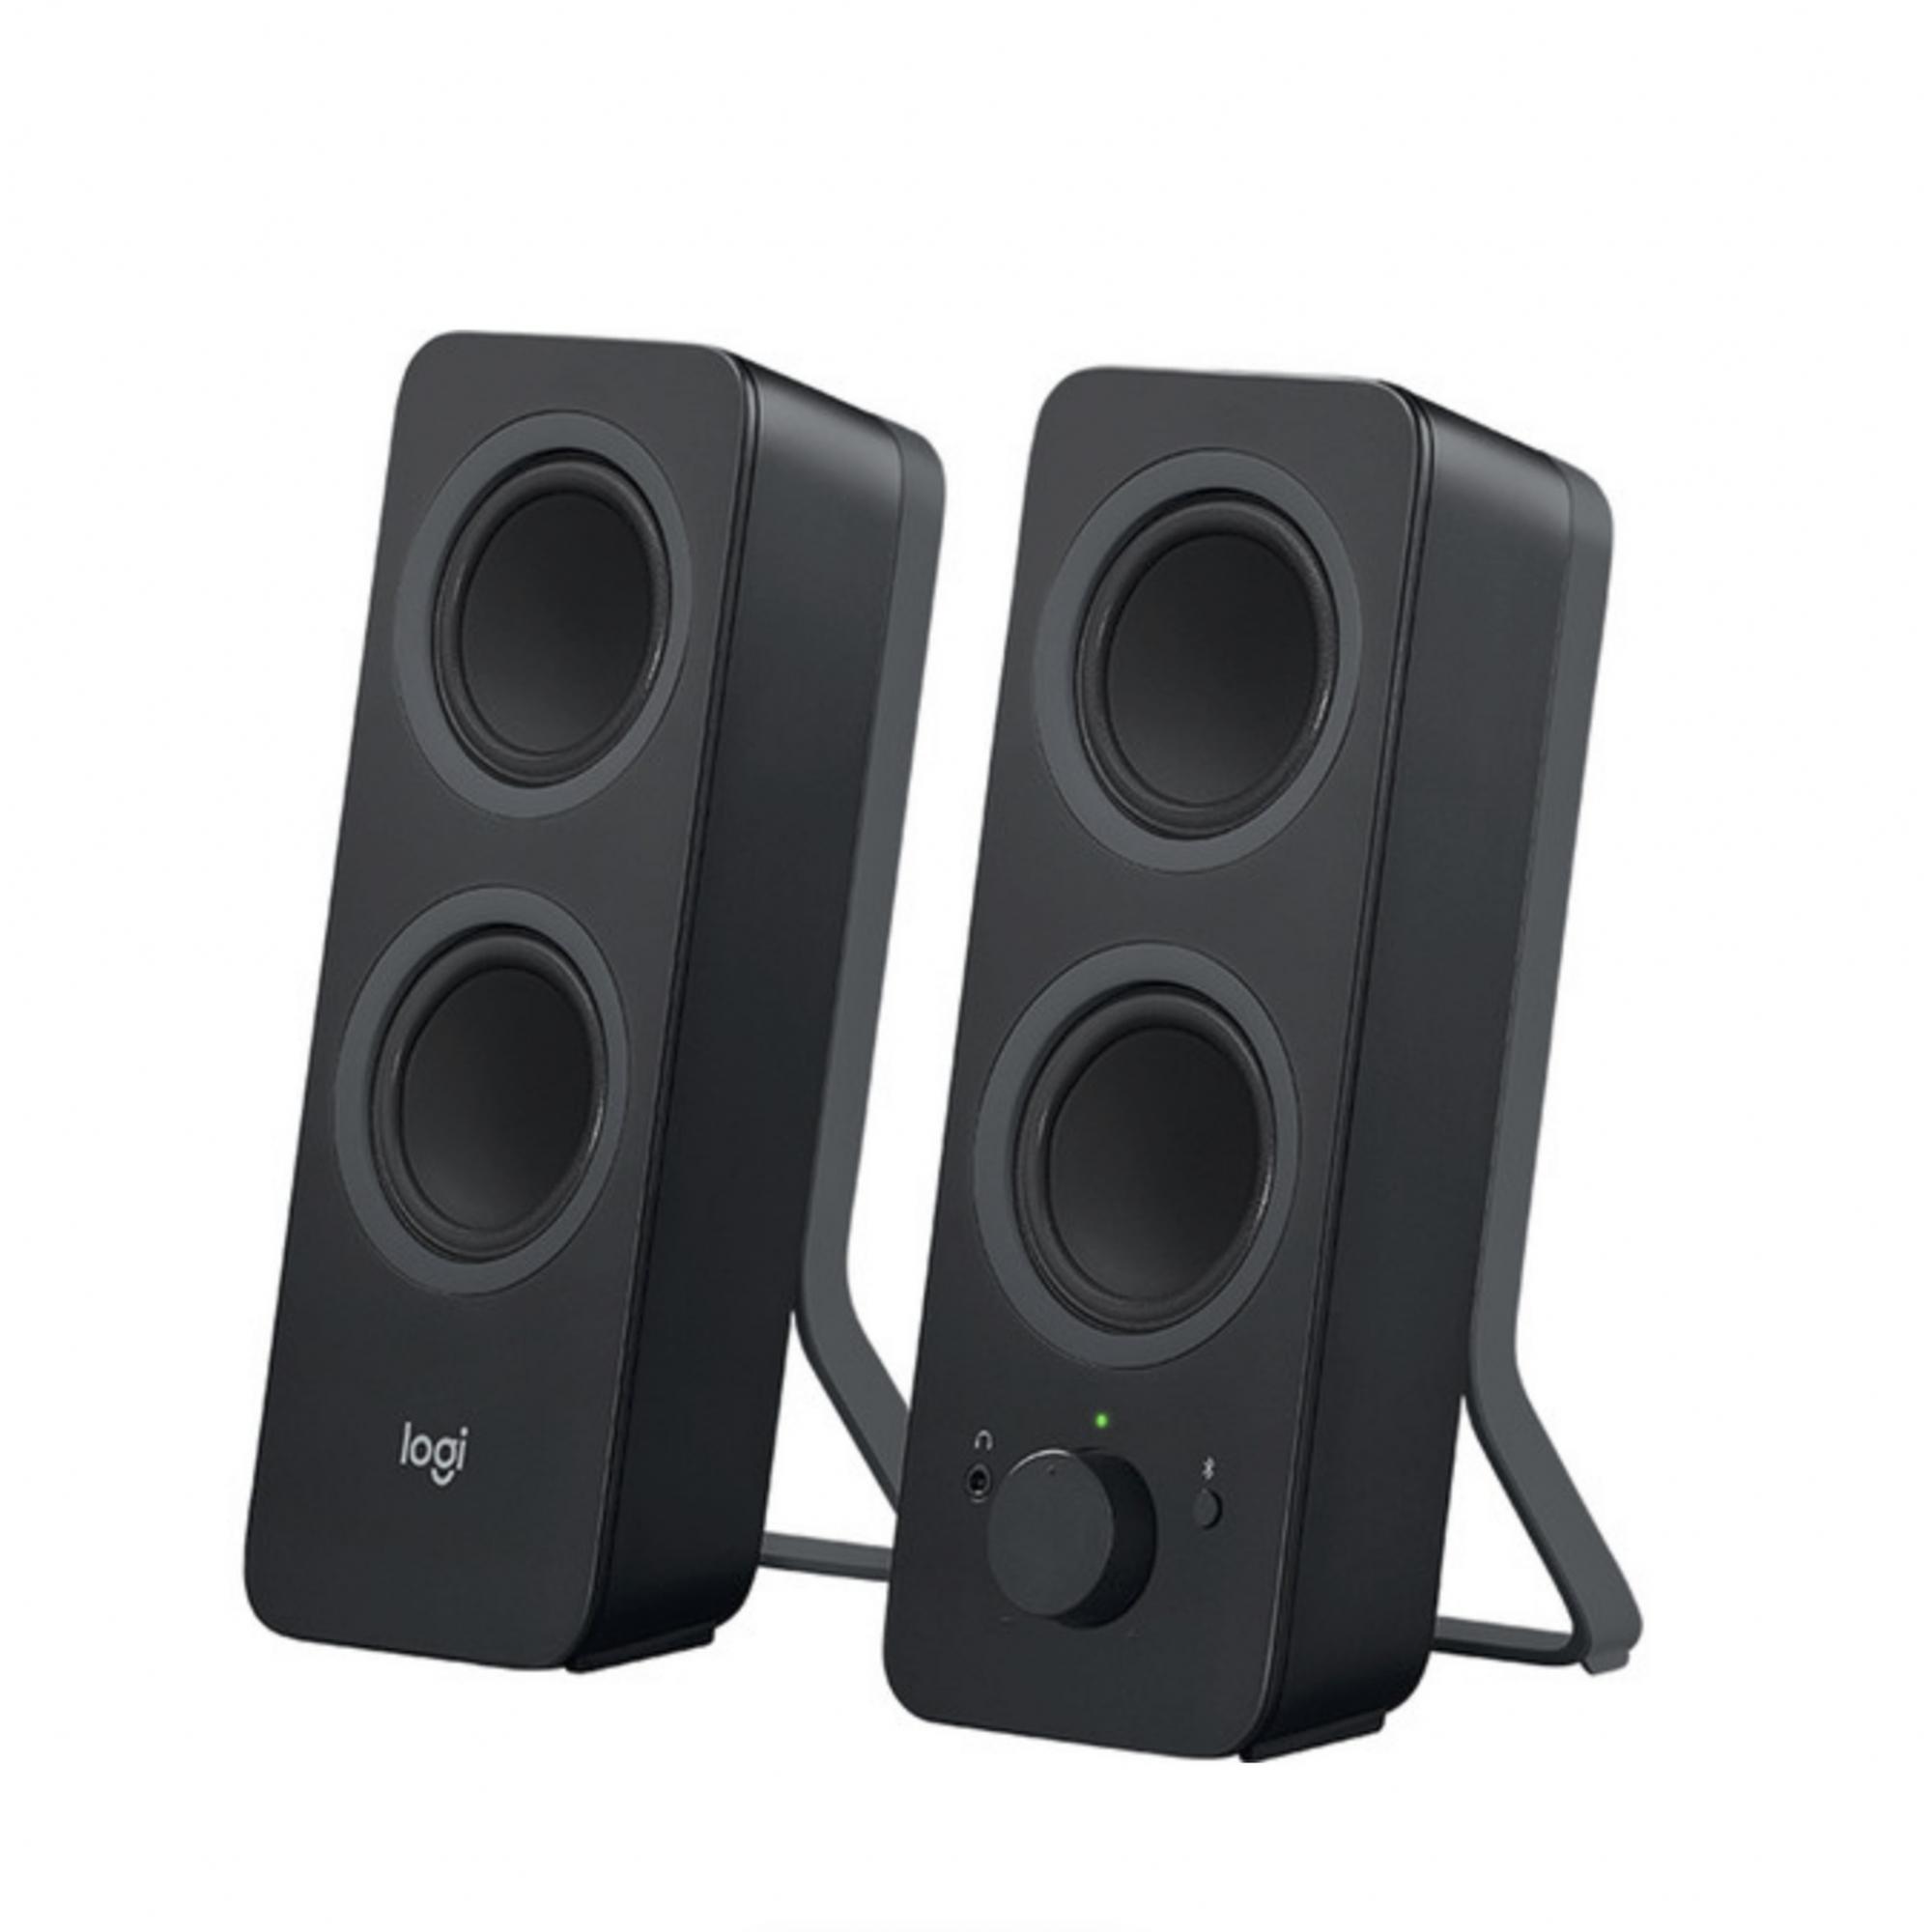 L o g i t e c h  -  Z207 Alto-falantes Bluetooth Para Computador Bivolt